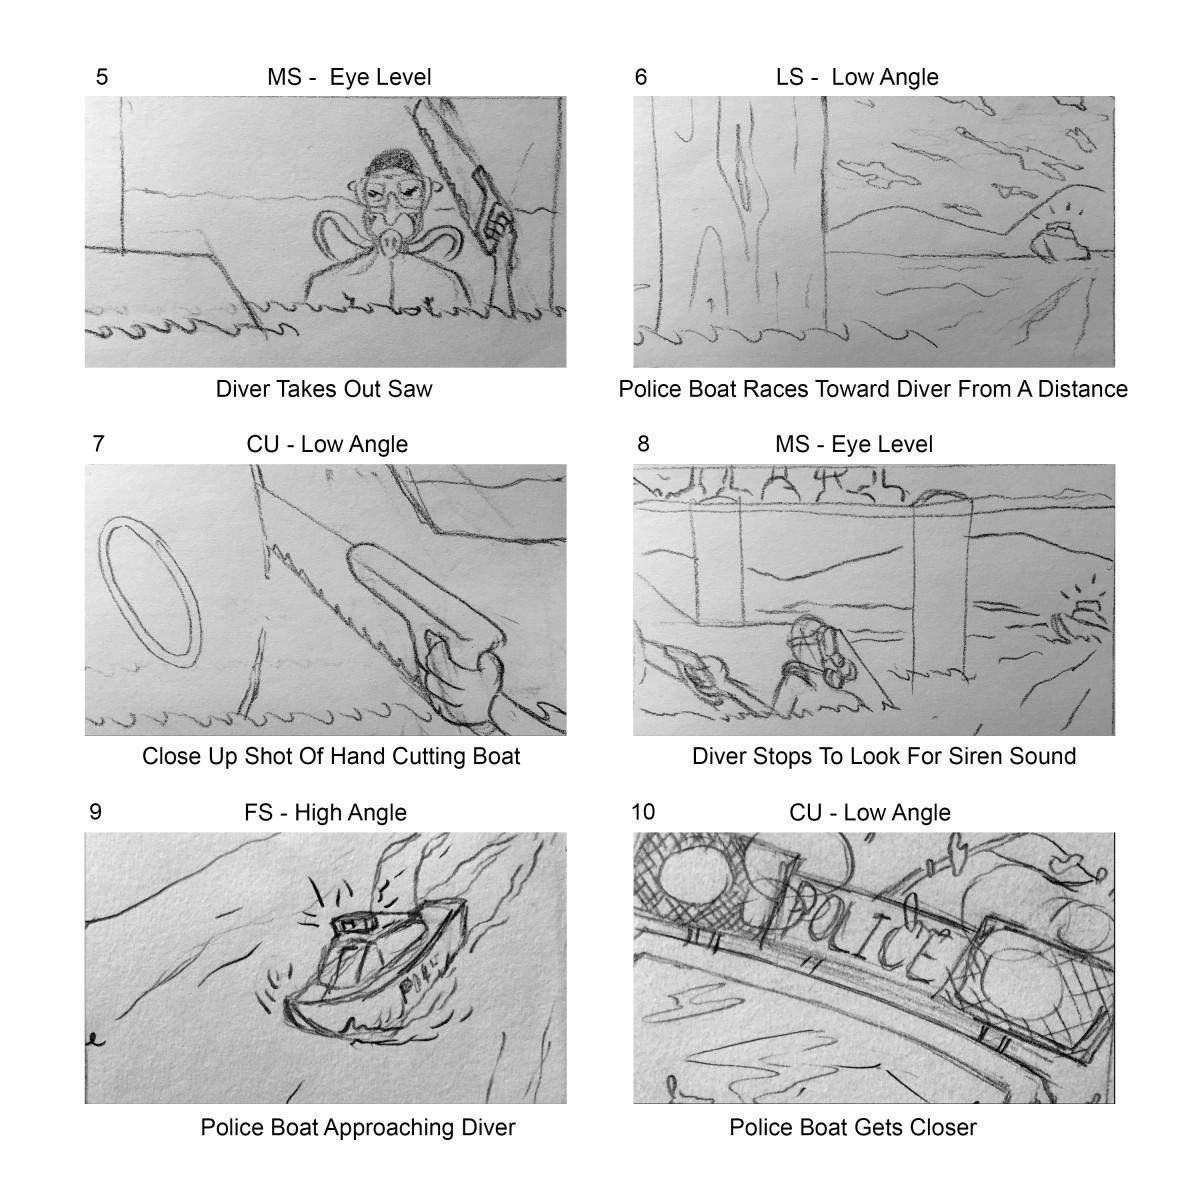 16x9 Ratio Storyboard Template 2